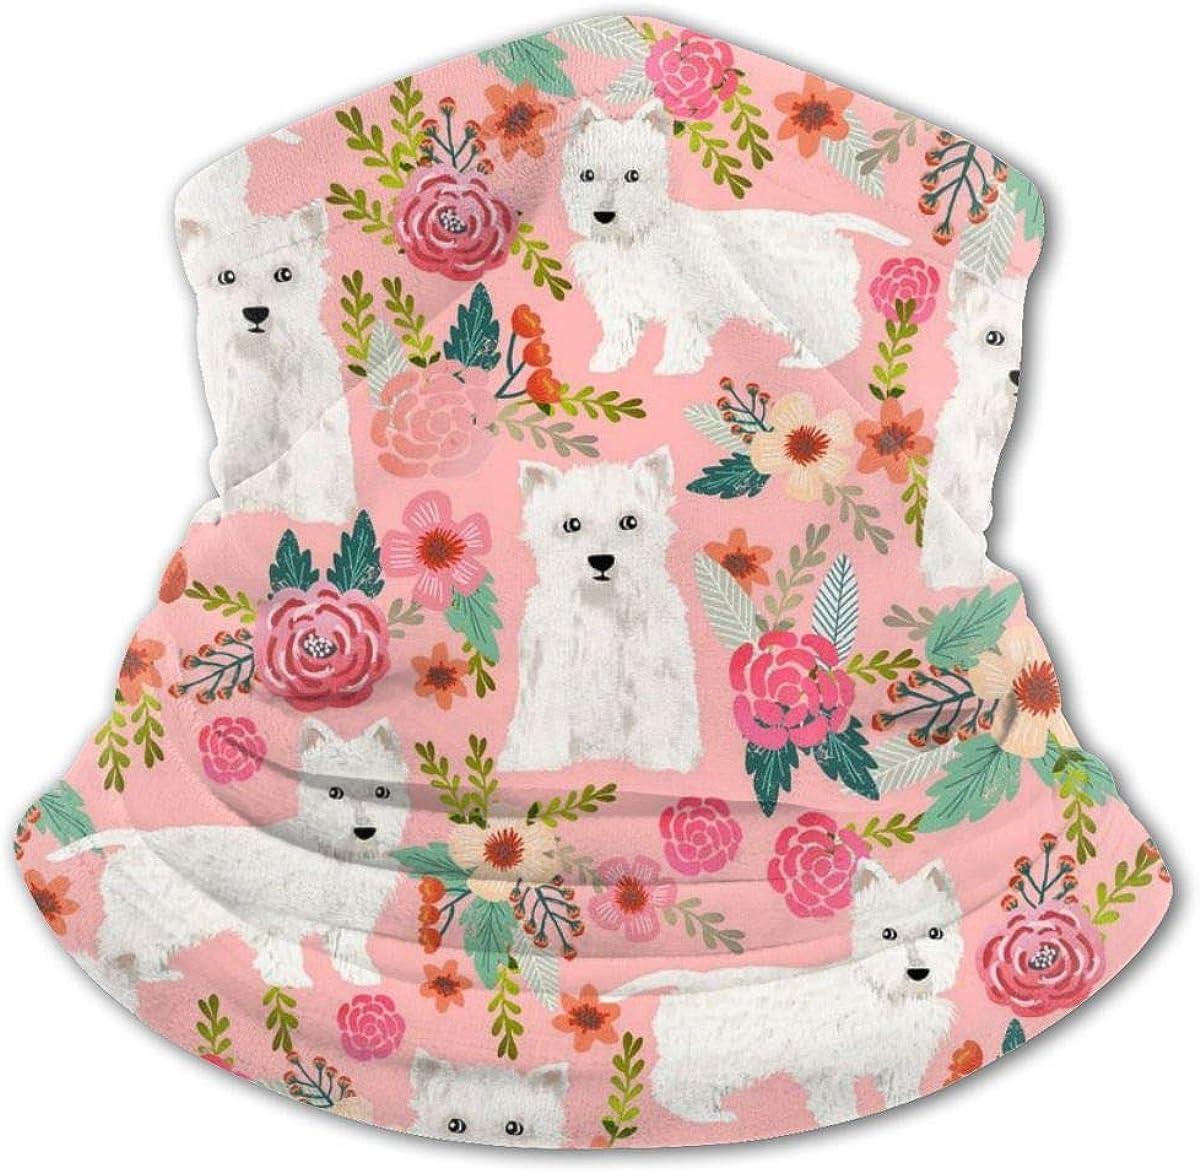 Westie Floral Headwear For Girls And Boys, Head Wrap, Neck Gaiter, Headband, Tenn Fishing Mask, Magic Scarf, Tube Mask, Face Bandana Mask For Camping Running Cycling